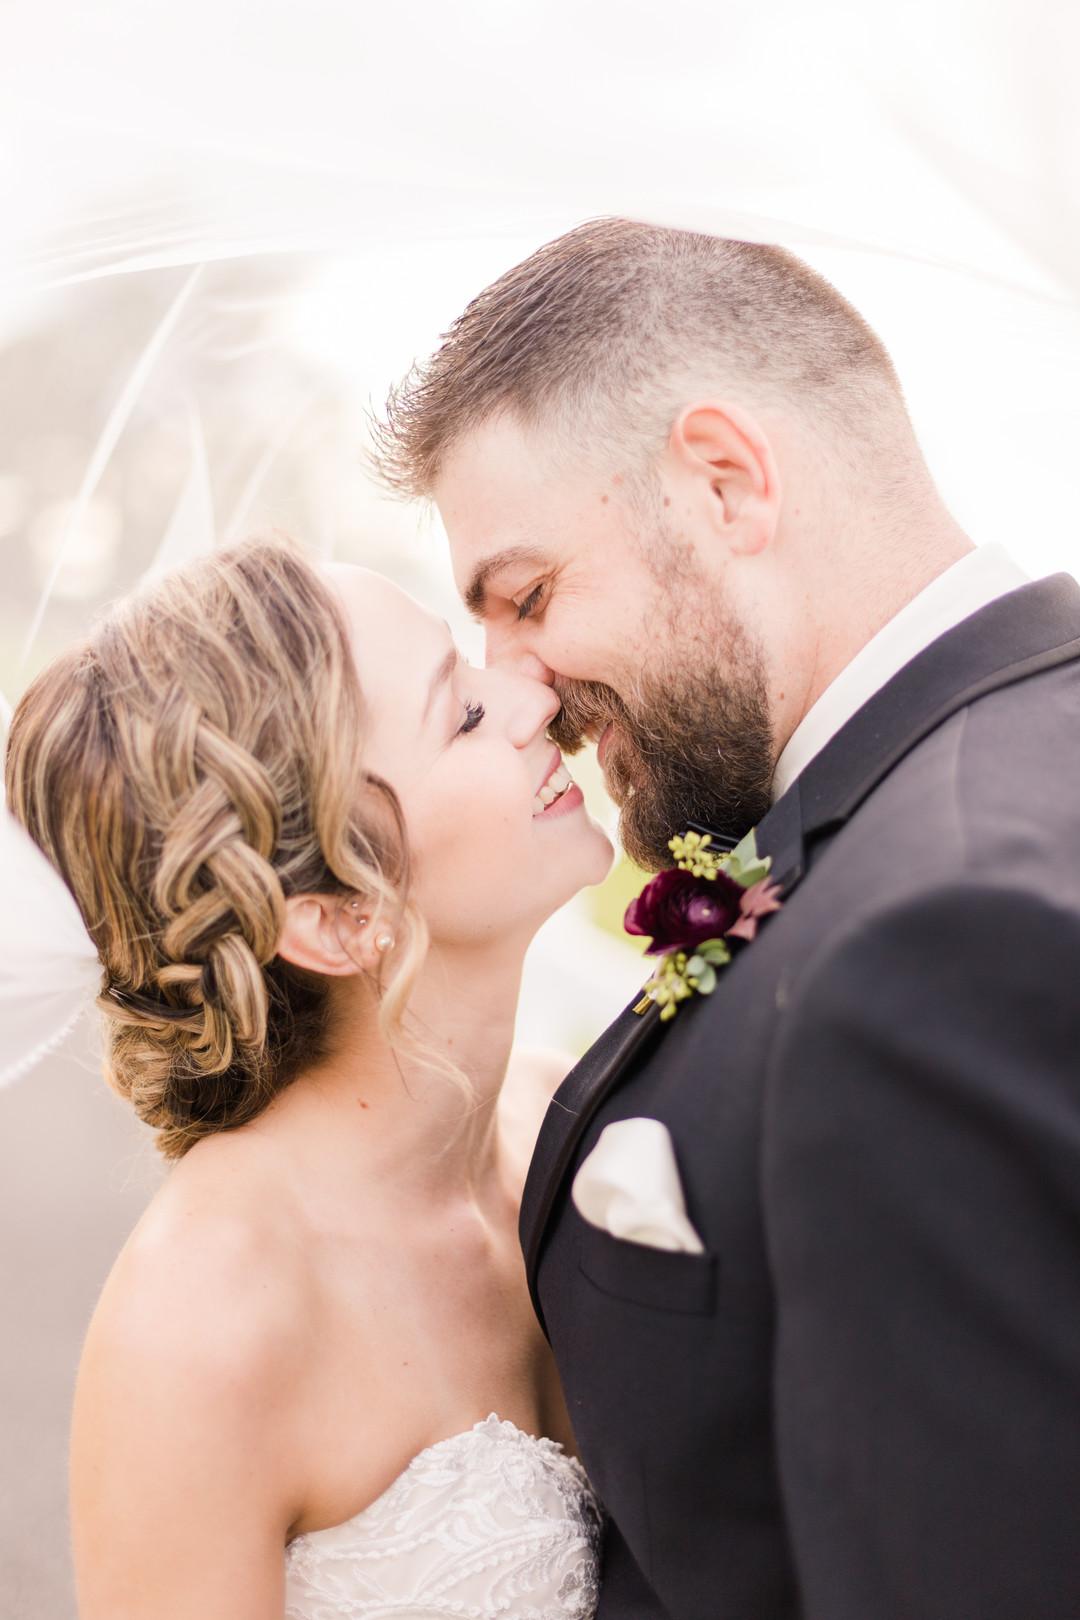 A Whimsical Garden Wedding – Rachel and Nate